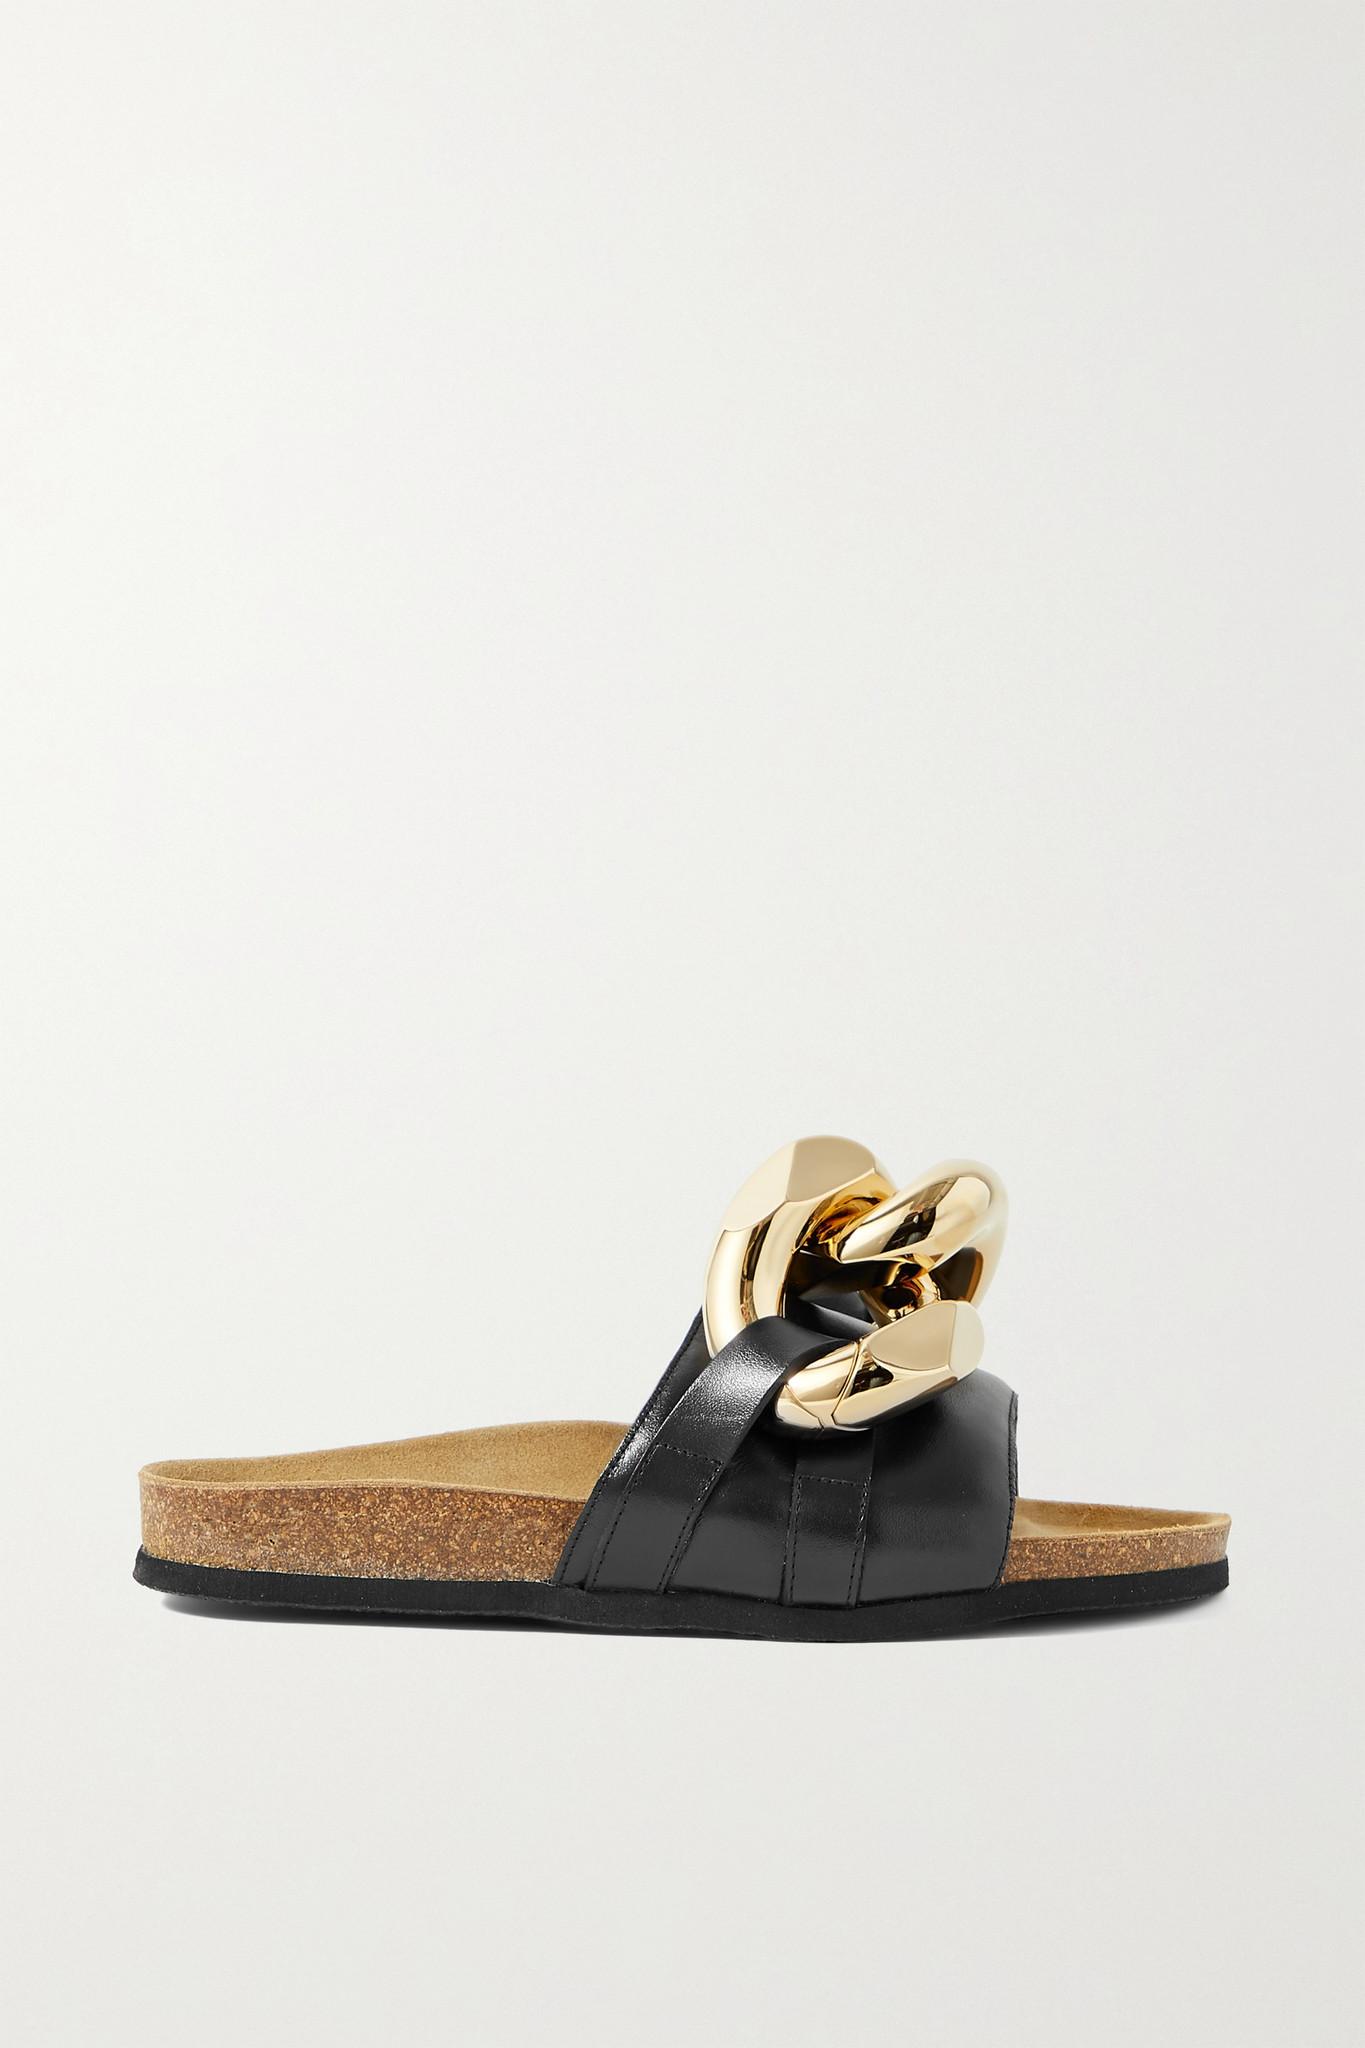 JW ANDERSON - Chain-embellished Leather Slides - Black - IT39